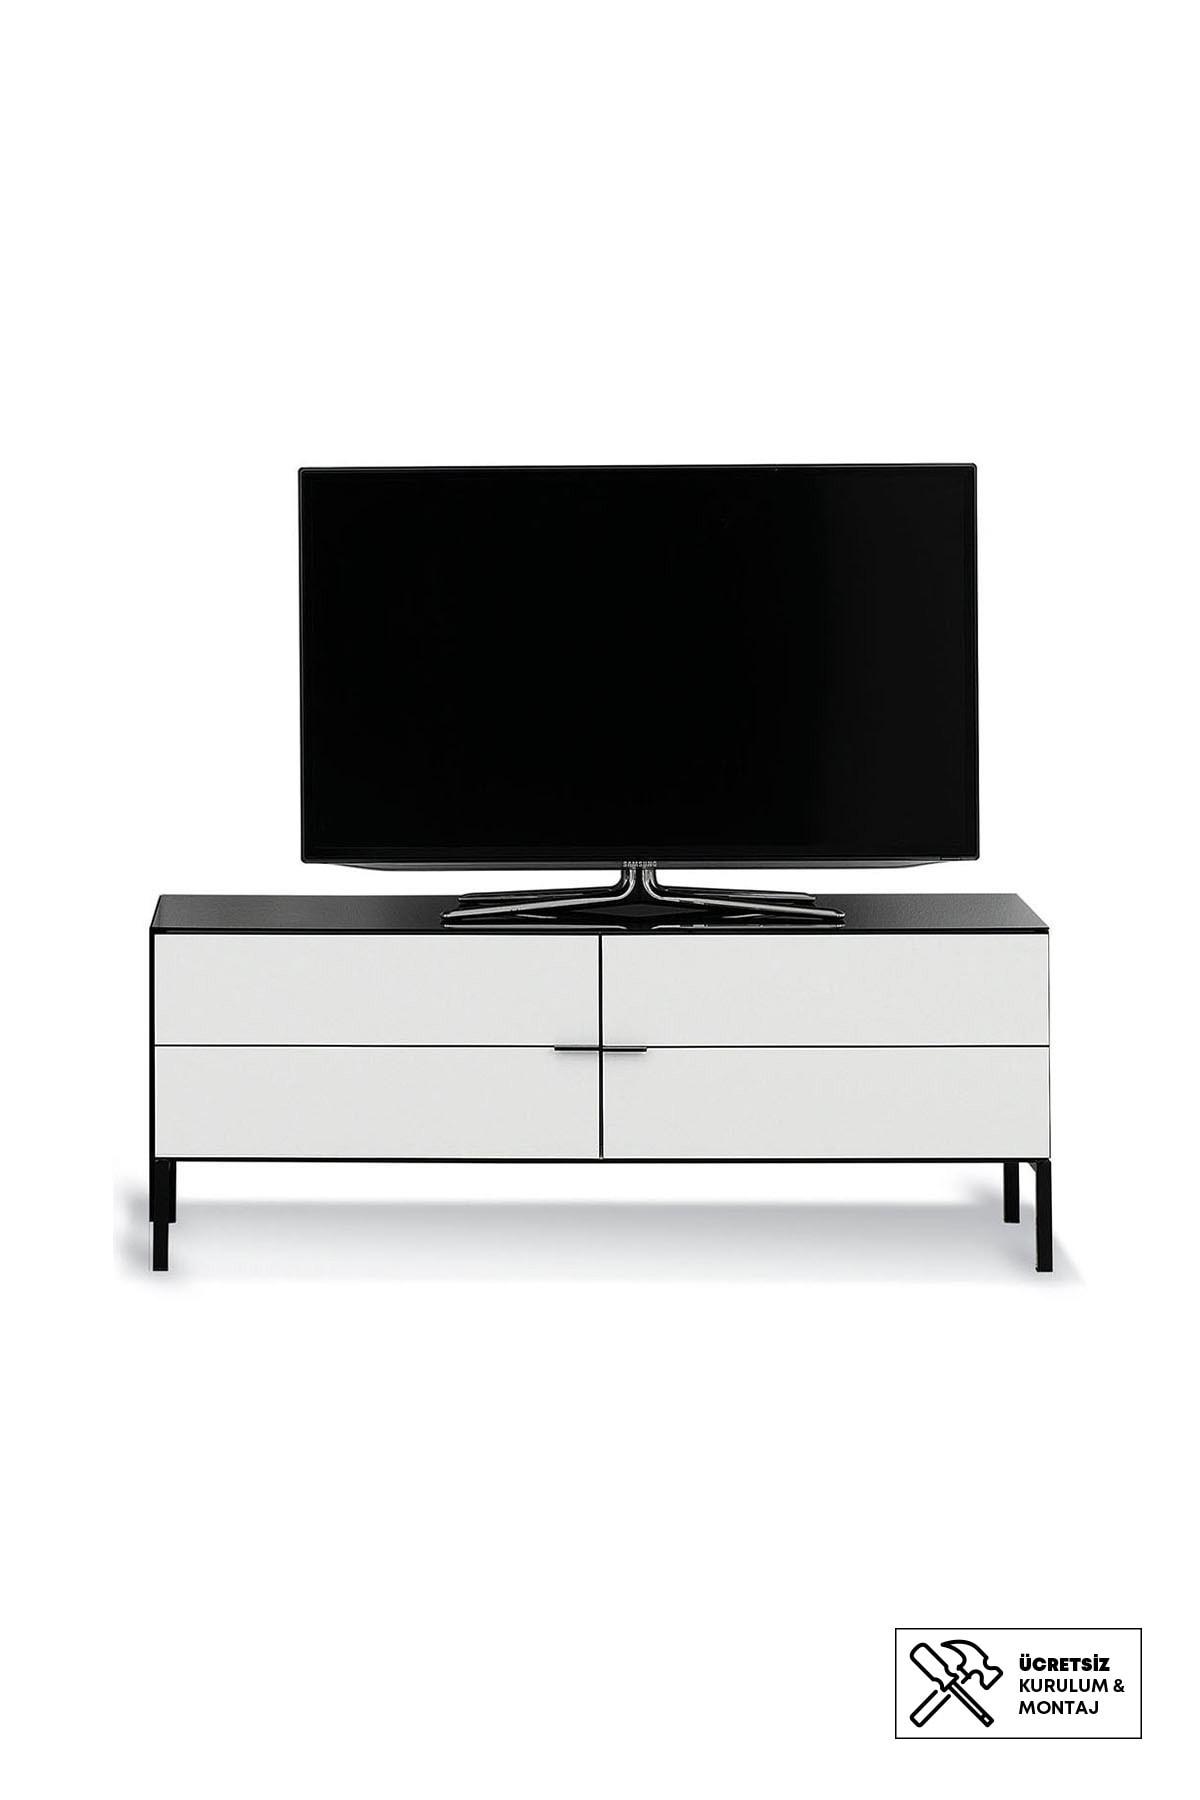 Enza Home Crystal 2 Kapaklı Alçak Tv Sehpası (45X120X45 Cm)